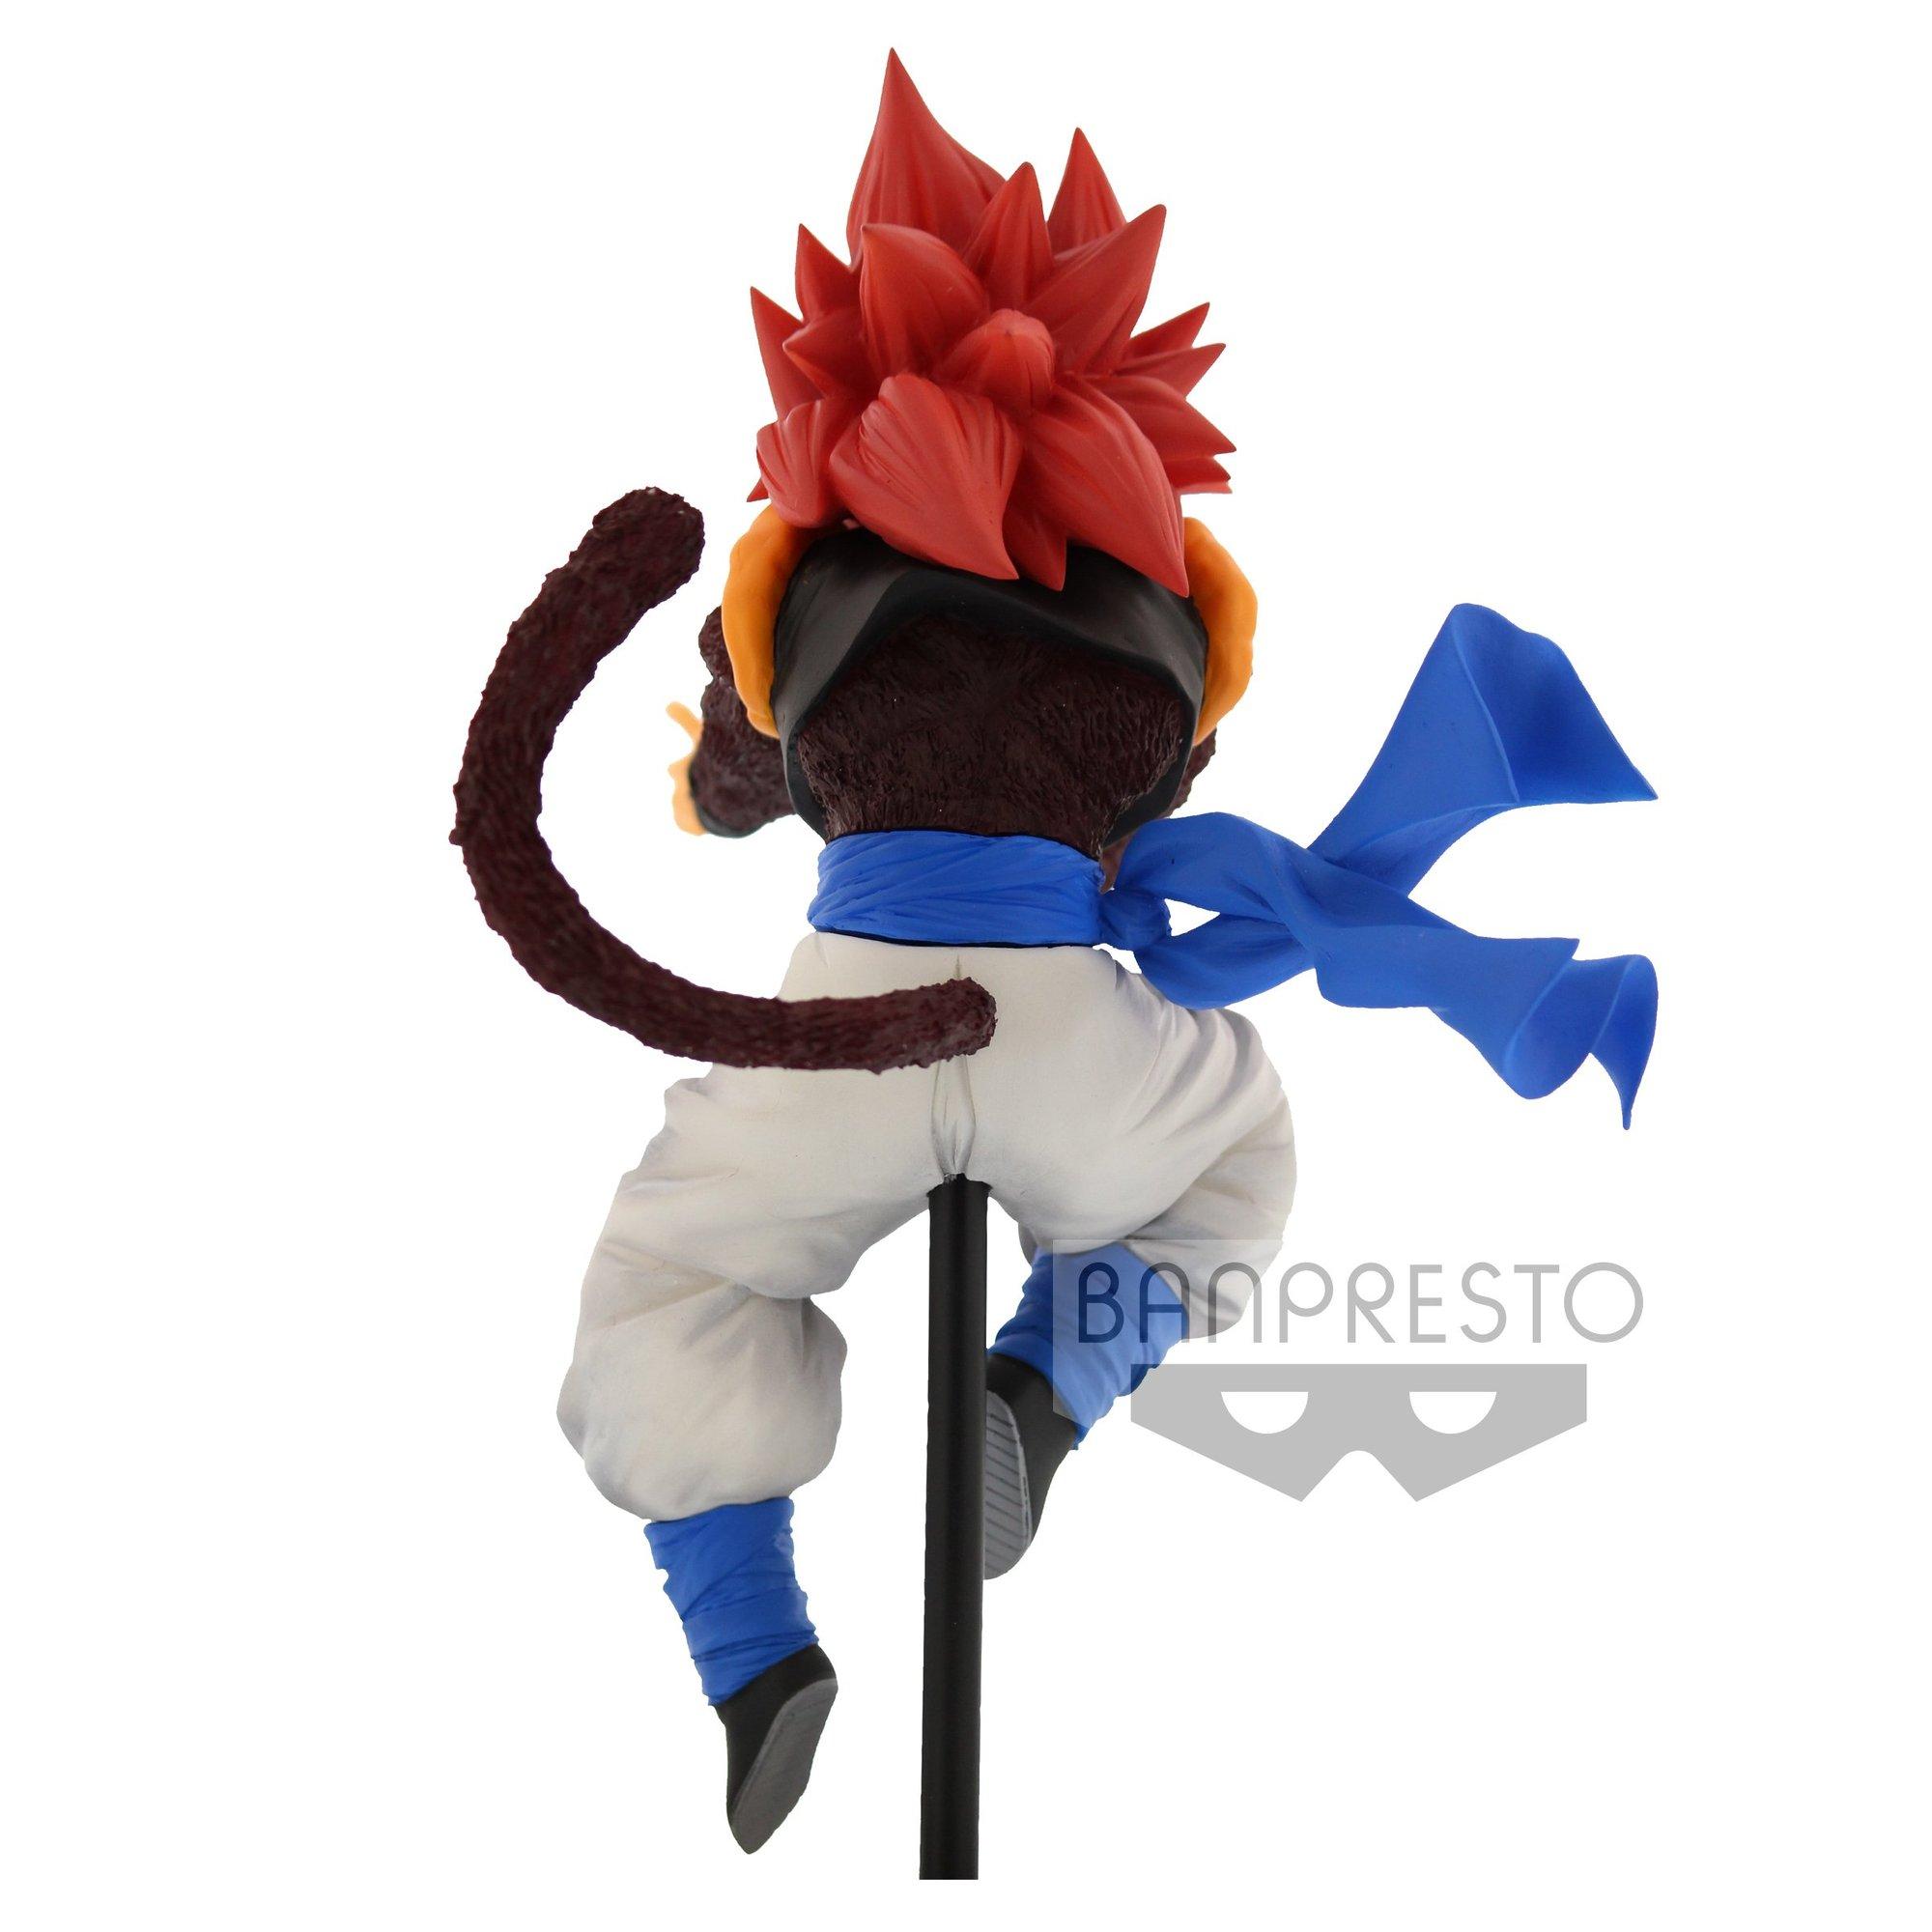 Banpresto Dragonball GT Ultimate Fusion Big Bang Kamehame-ha Figure